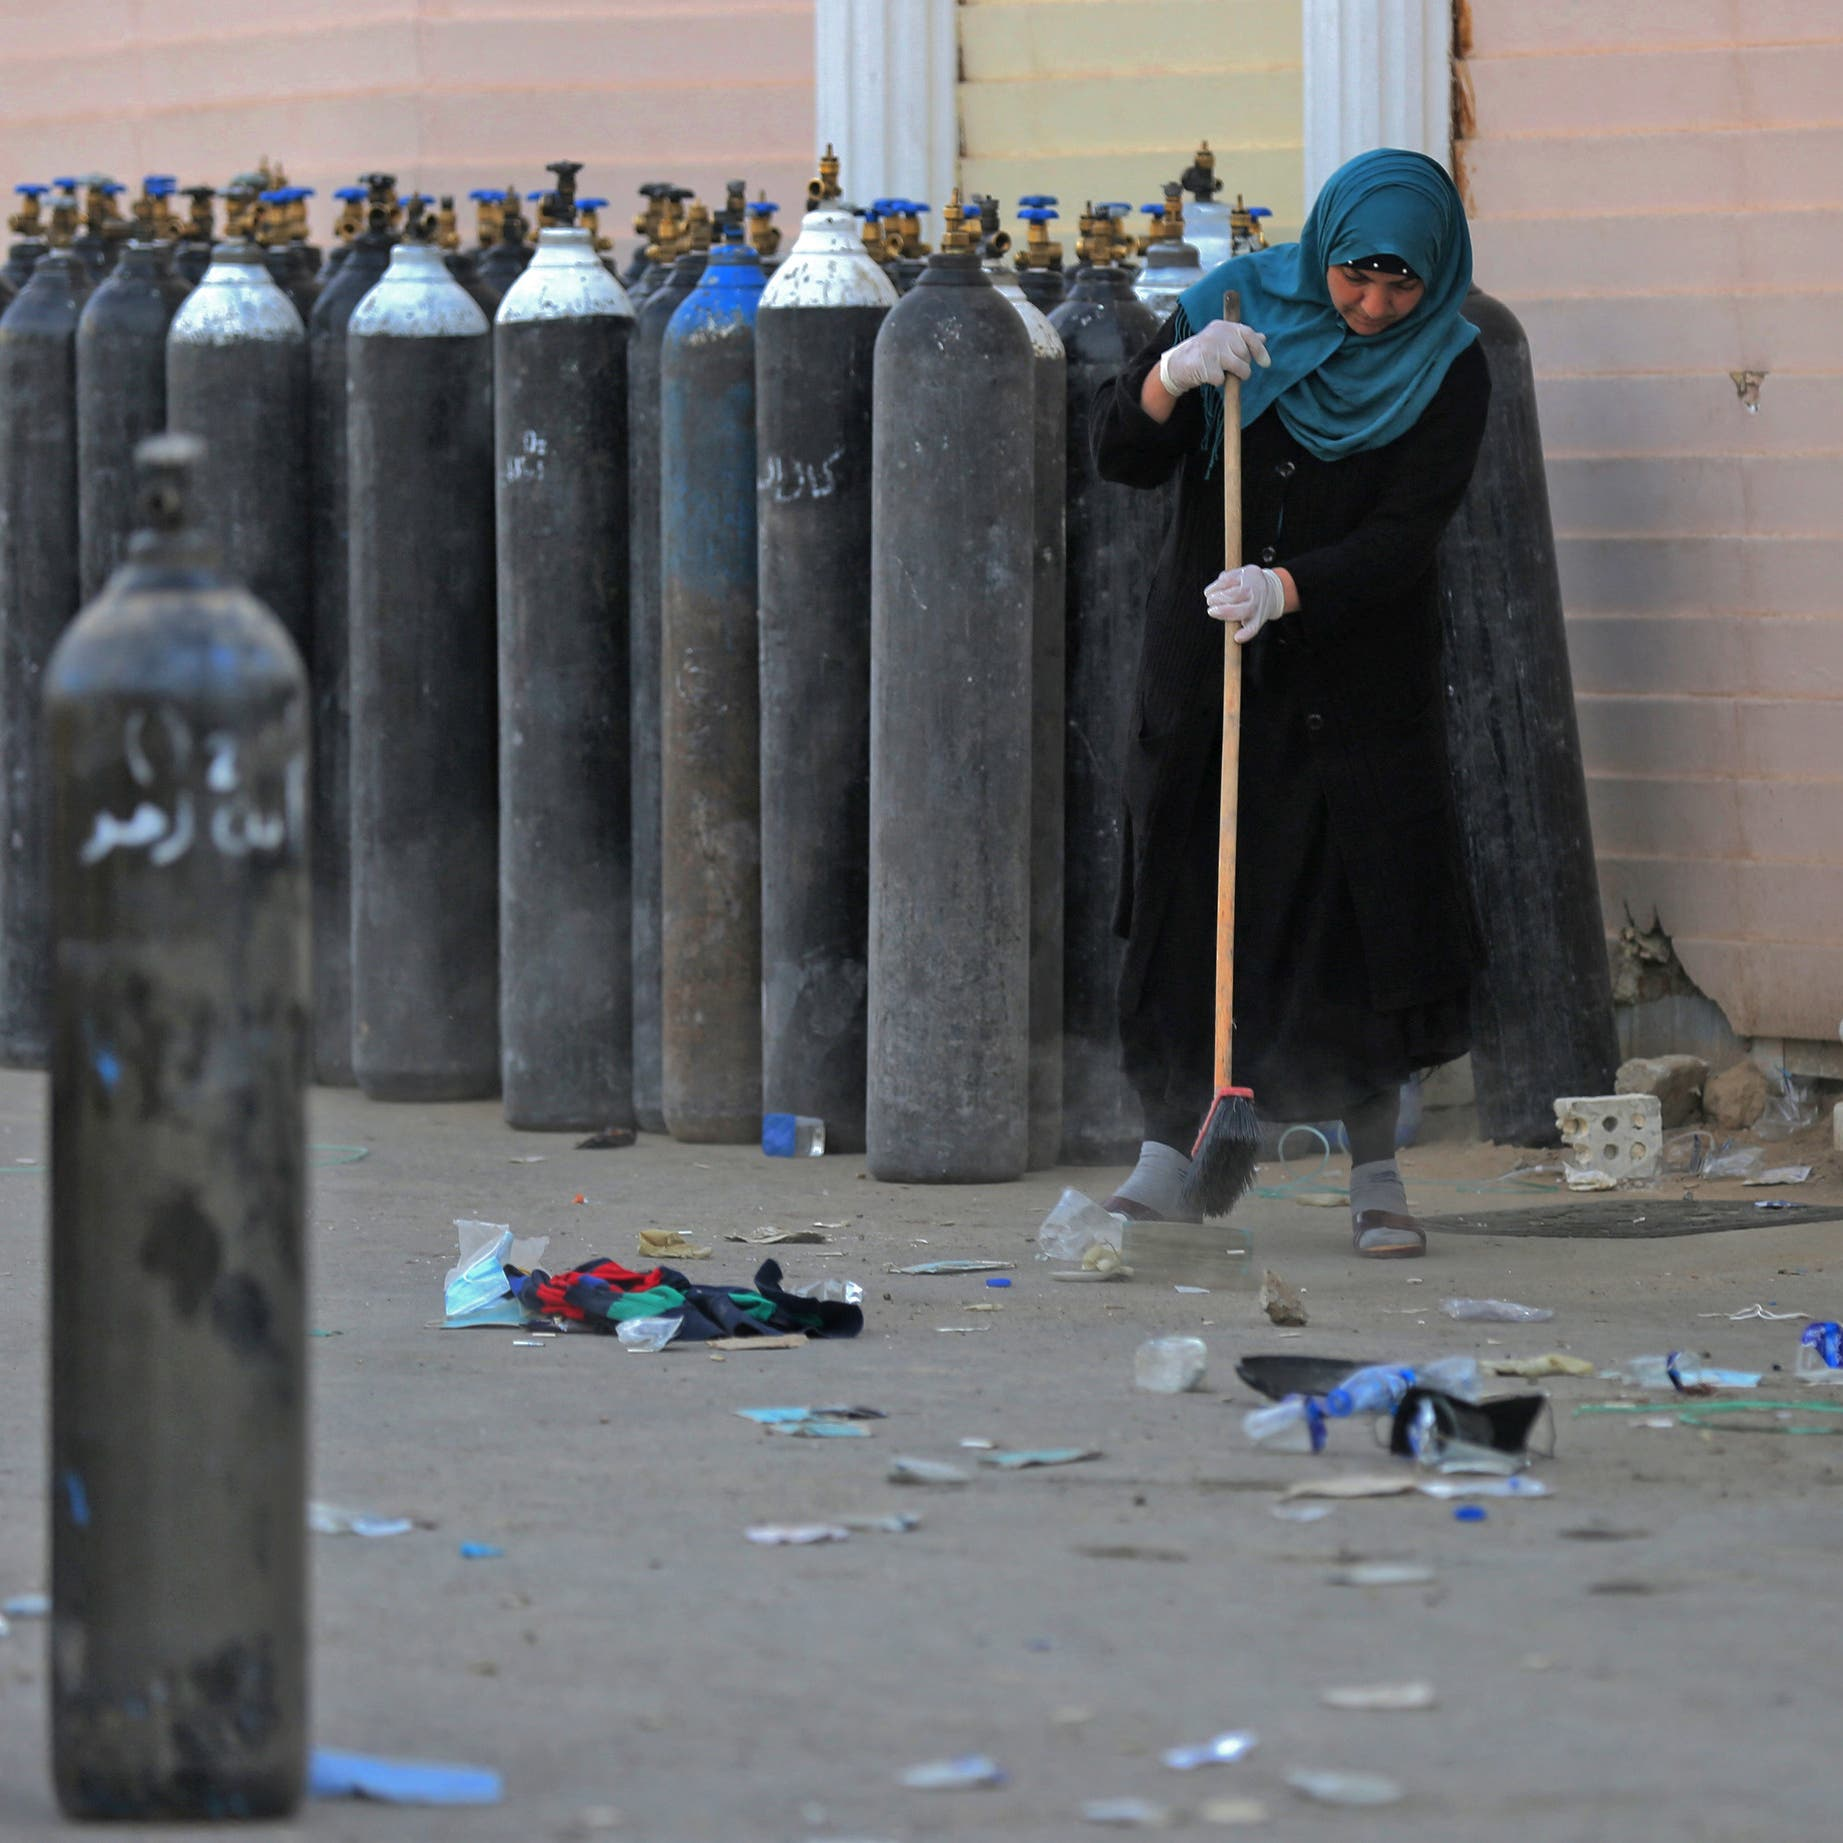 82 killed in Baghdad COVID-19 hospital fire: Iraqi interior ministry